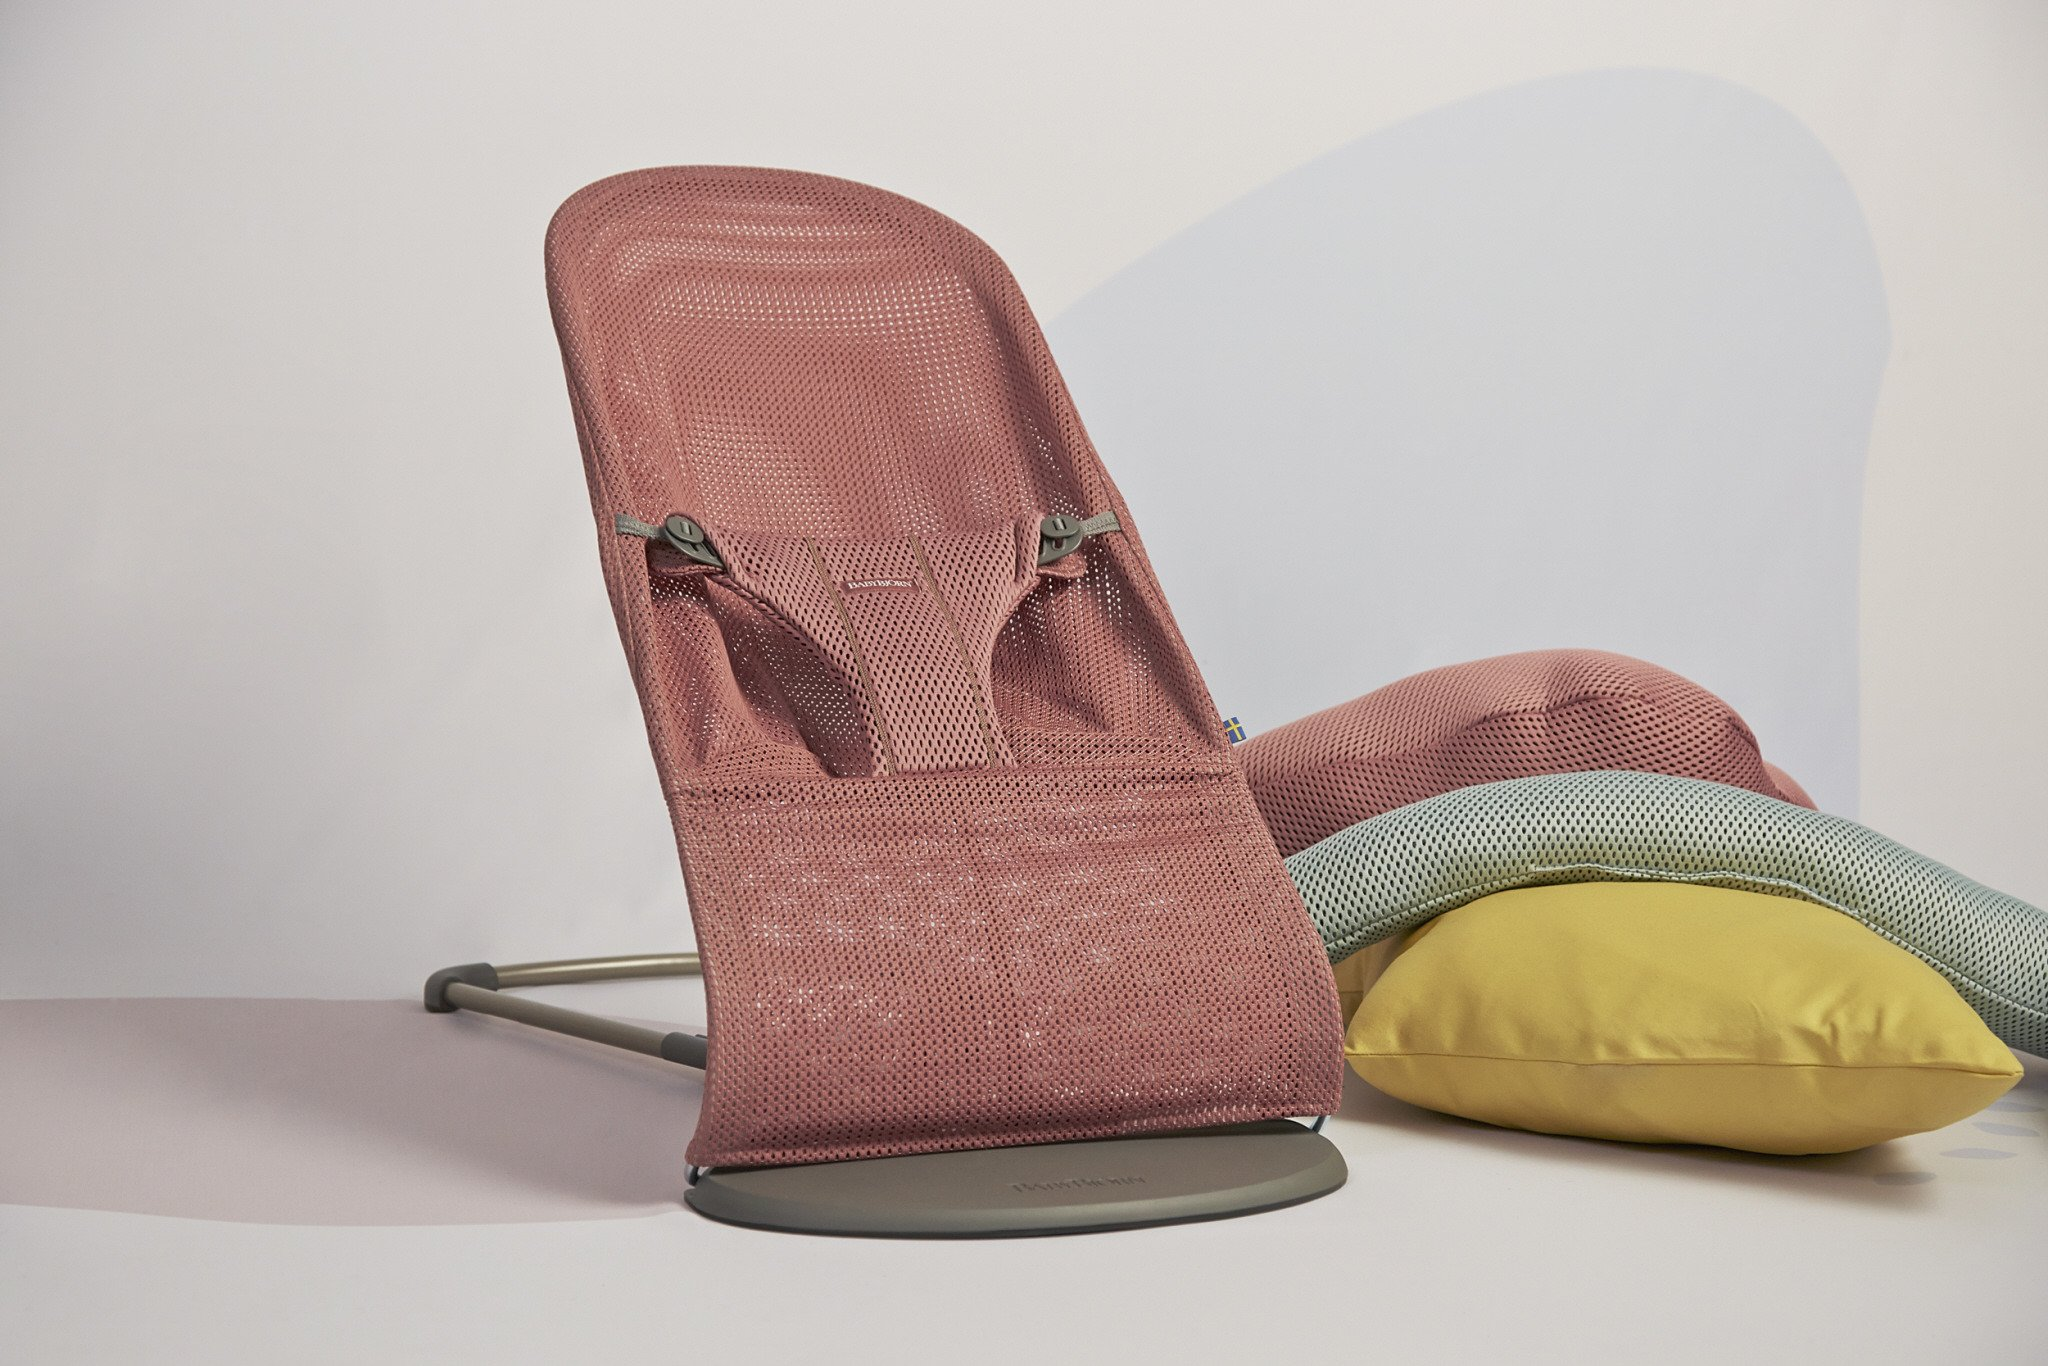 BABYBJORN - leżaczek BLISS MESH, Różowy